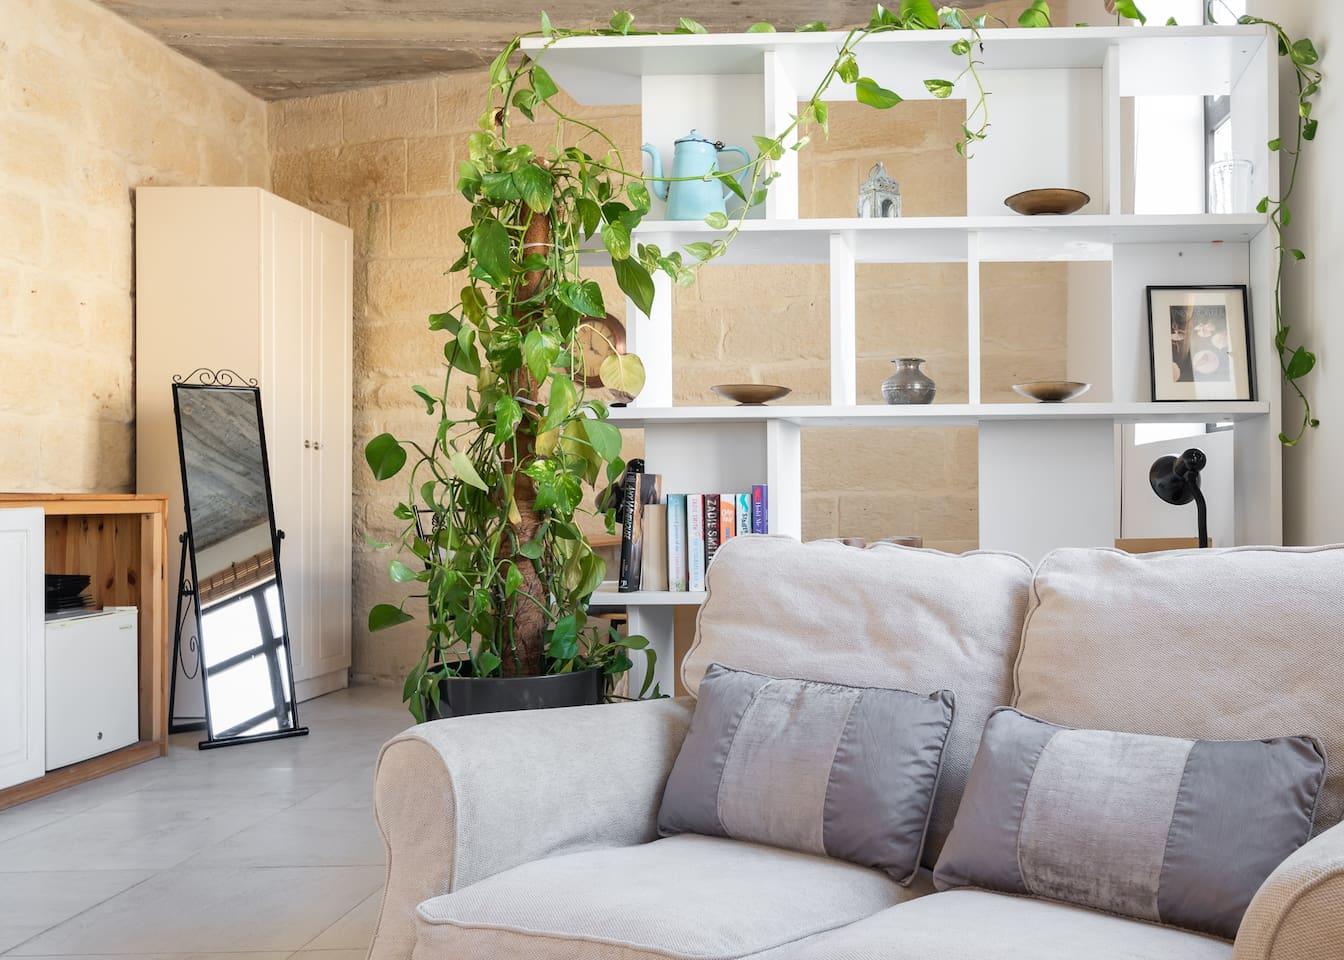 Modern Cozy Tiny Home Set In Gozo's Oldest Village